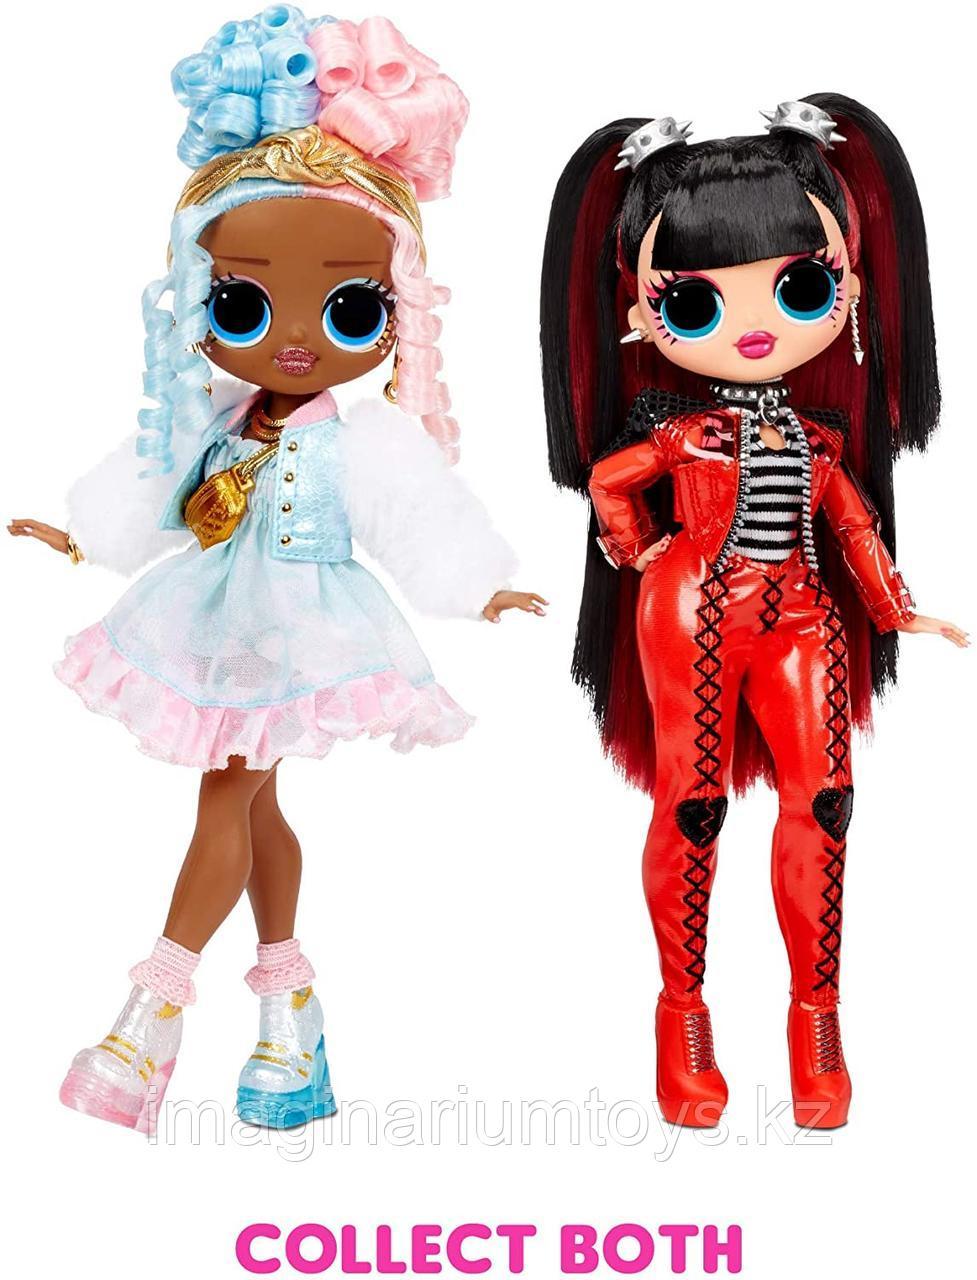 Большая Кукла ЛОЛ ОМГ 4 серия LOL OMG Spicy Babe - фото 2